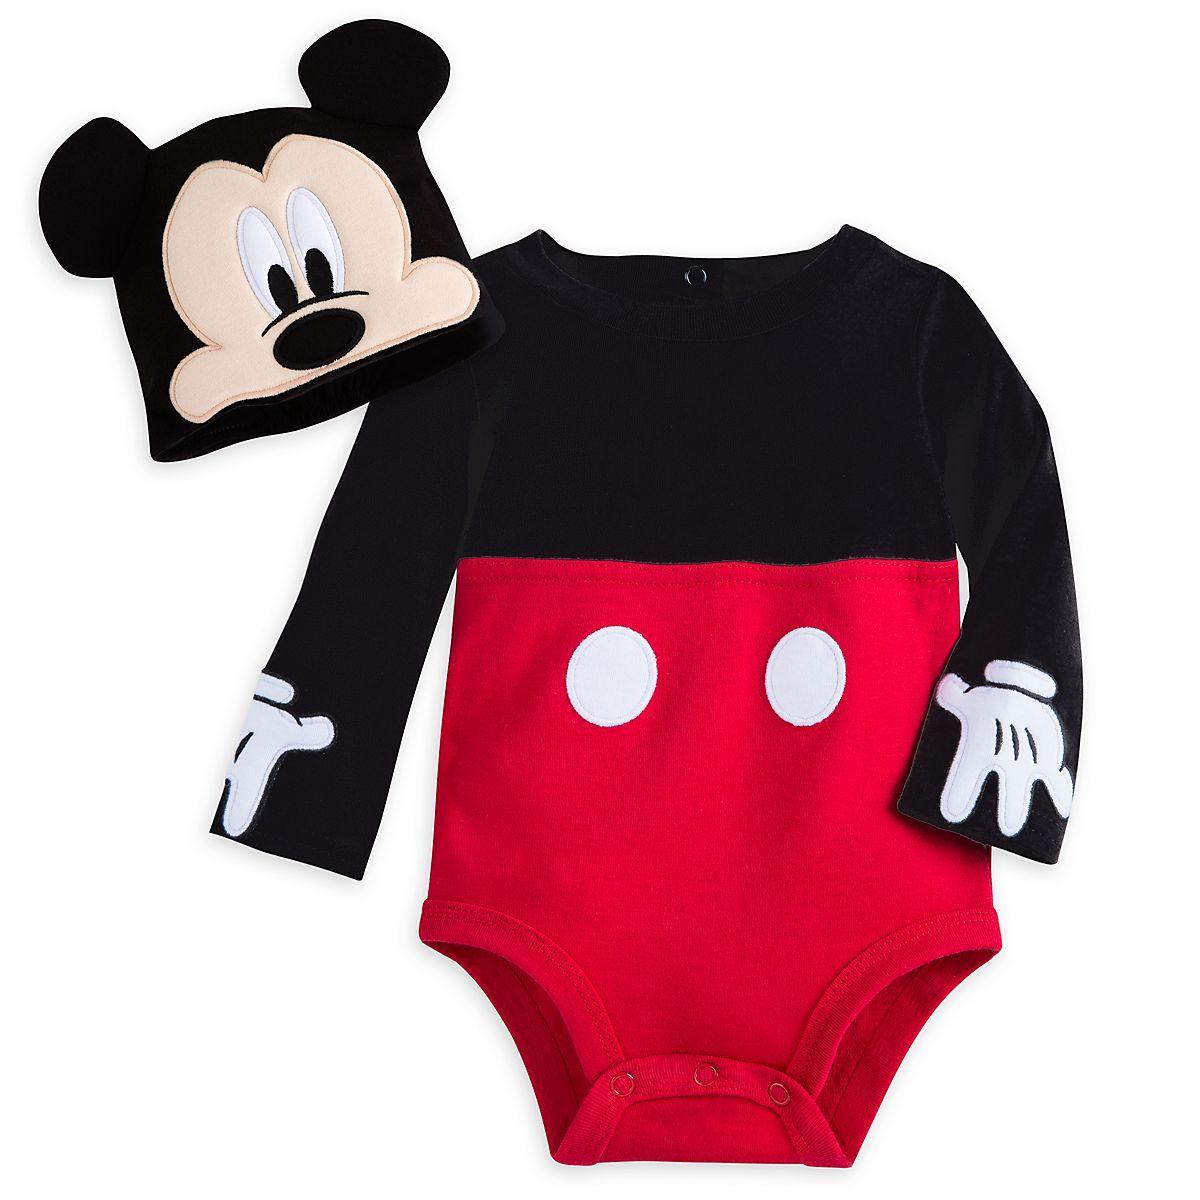 Disney Parks Mickey Mouse Tuxedo Costume Baby Bodysuit Halloween Dress Up Boy